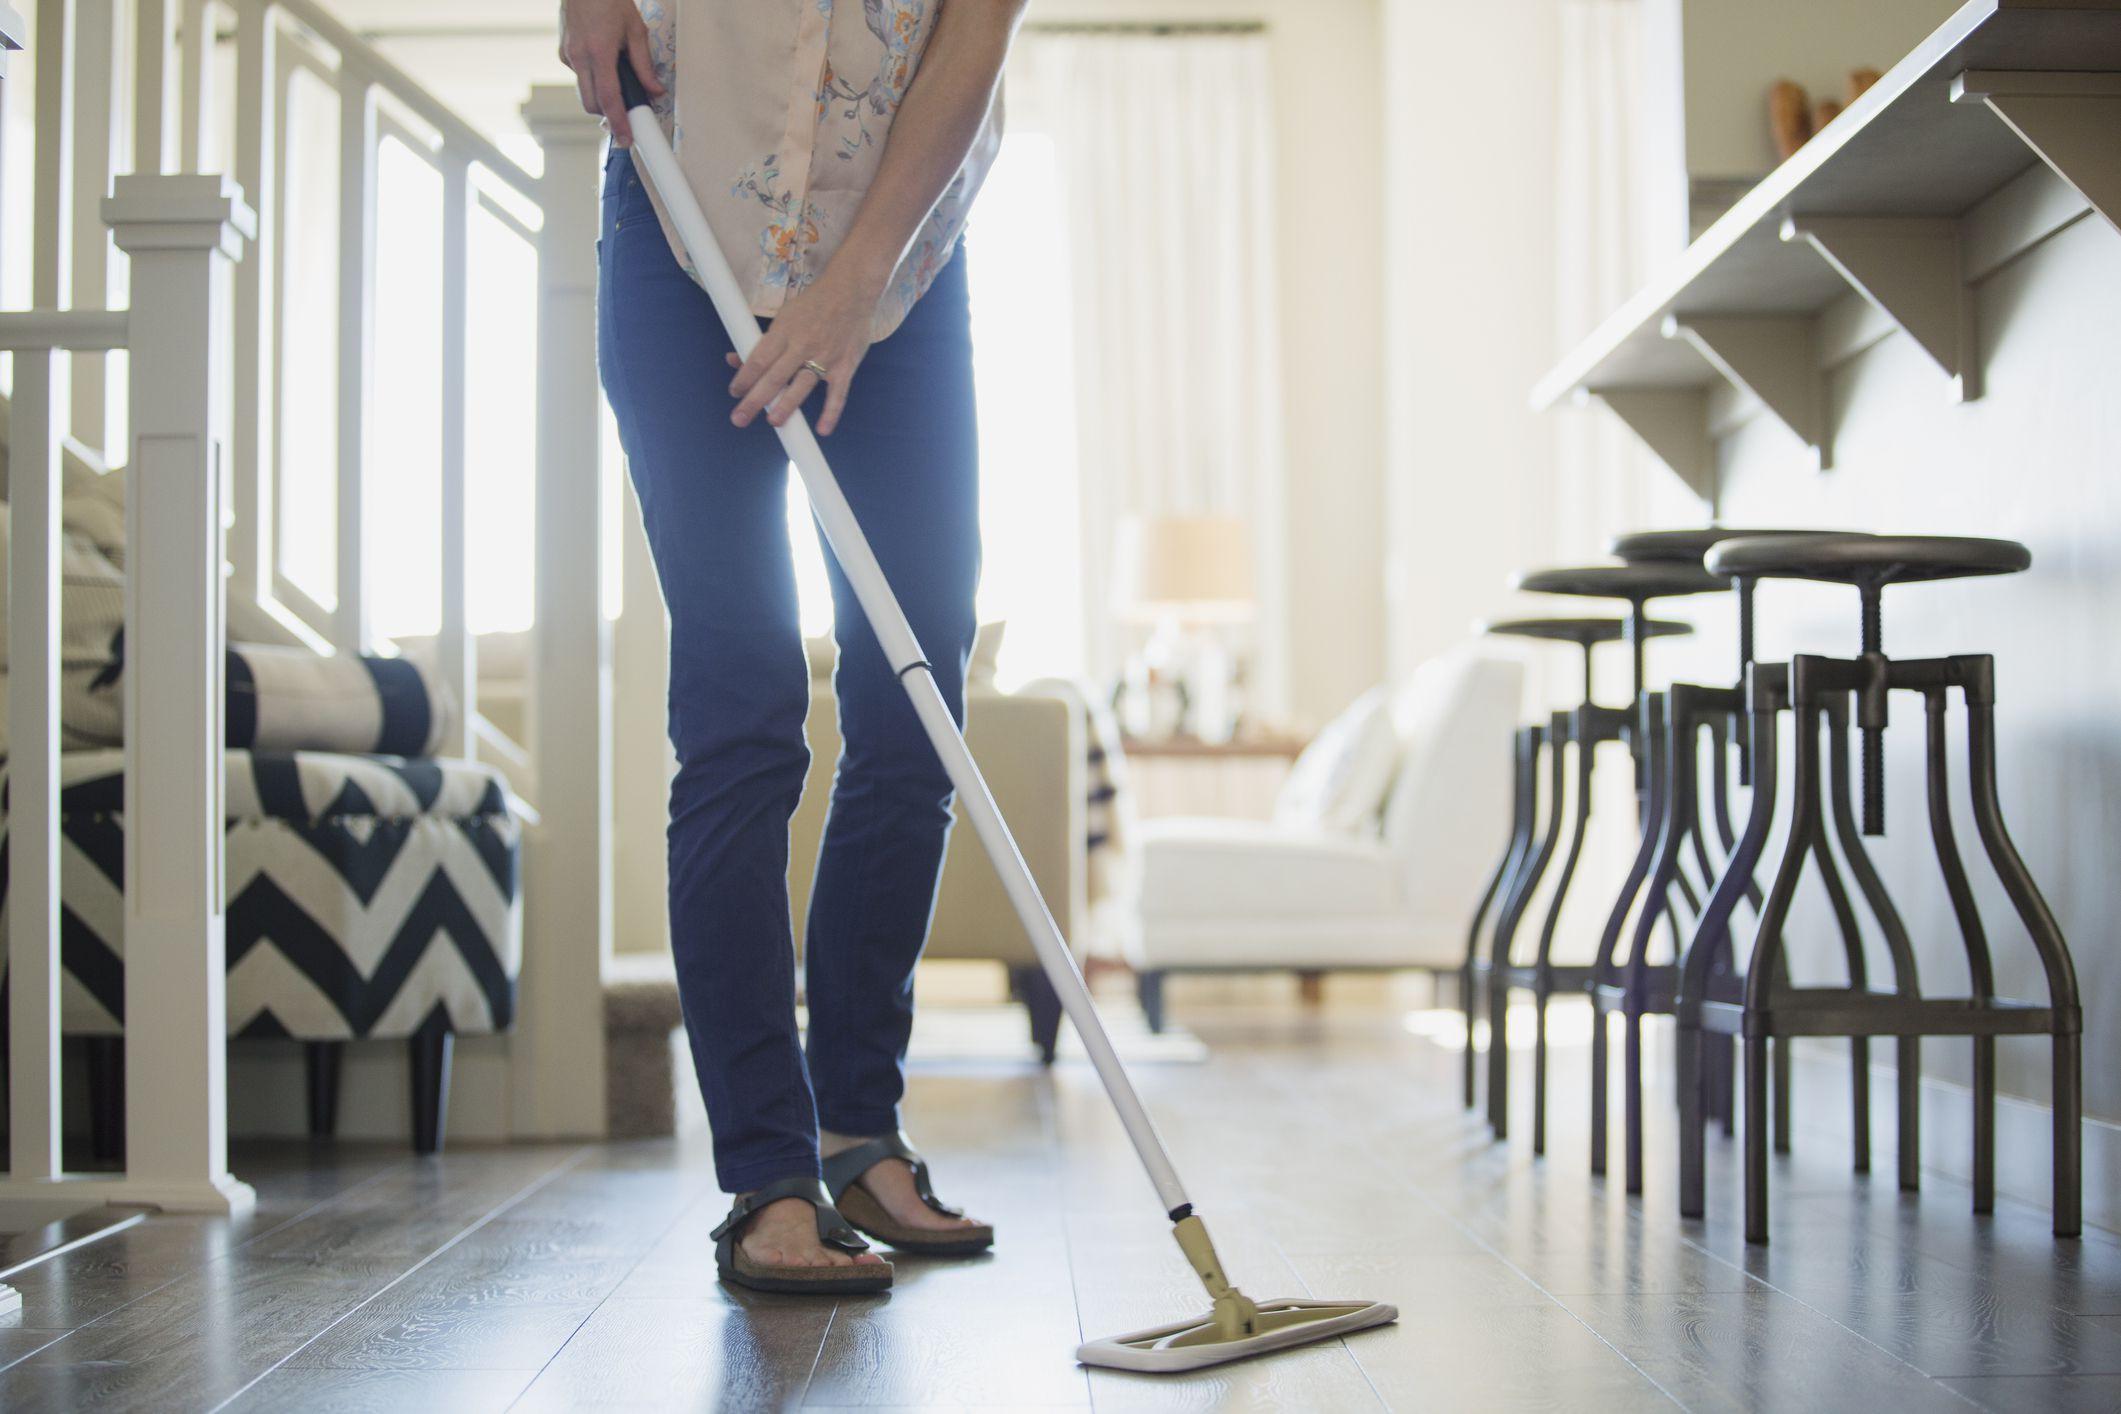 bona hardwood floor cleaning pads of the 8 best flat mops to buy in 2018 regarding flat mop 607041561 58ea83b95f9b58ef7e0e5d44